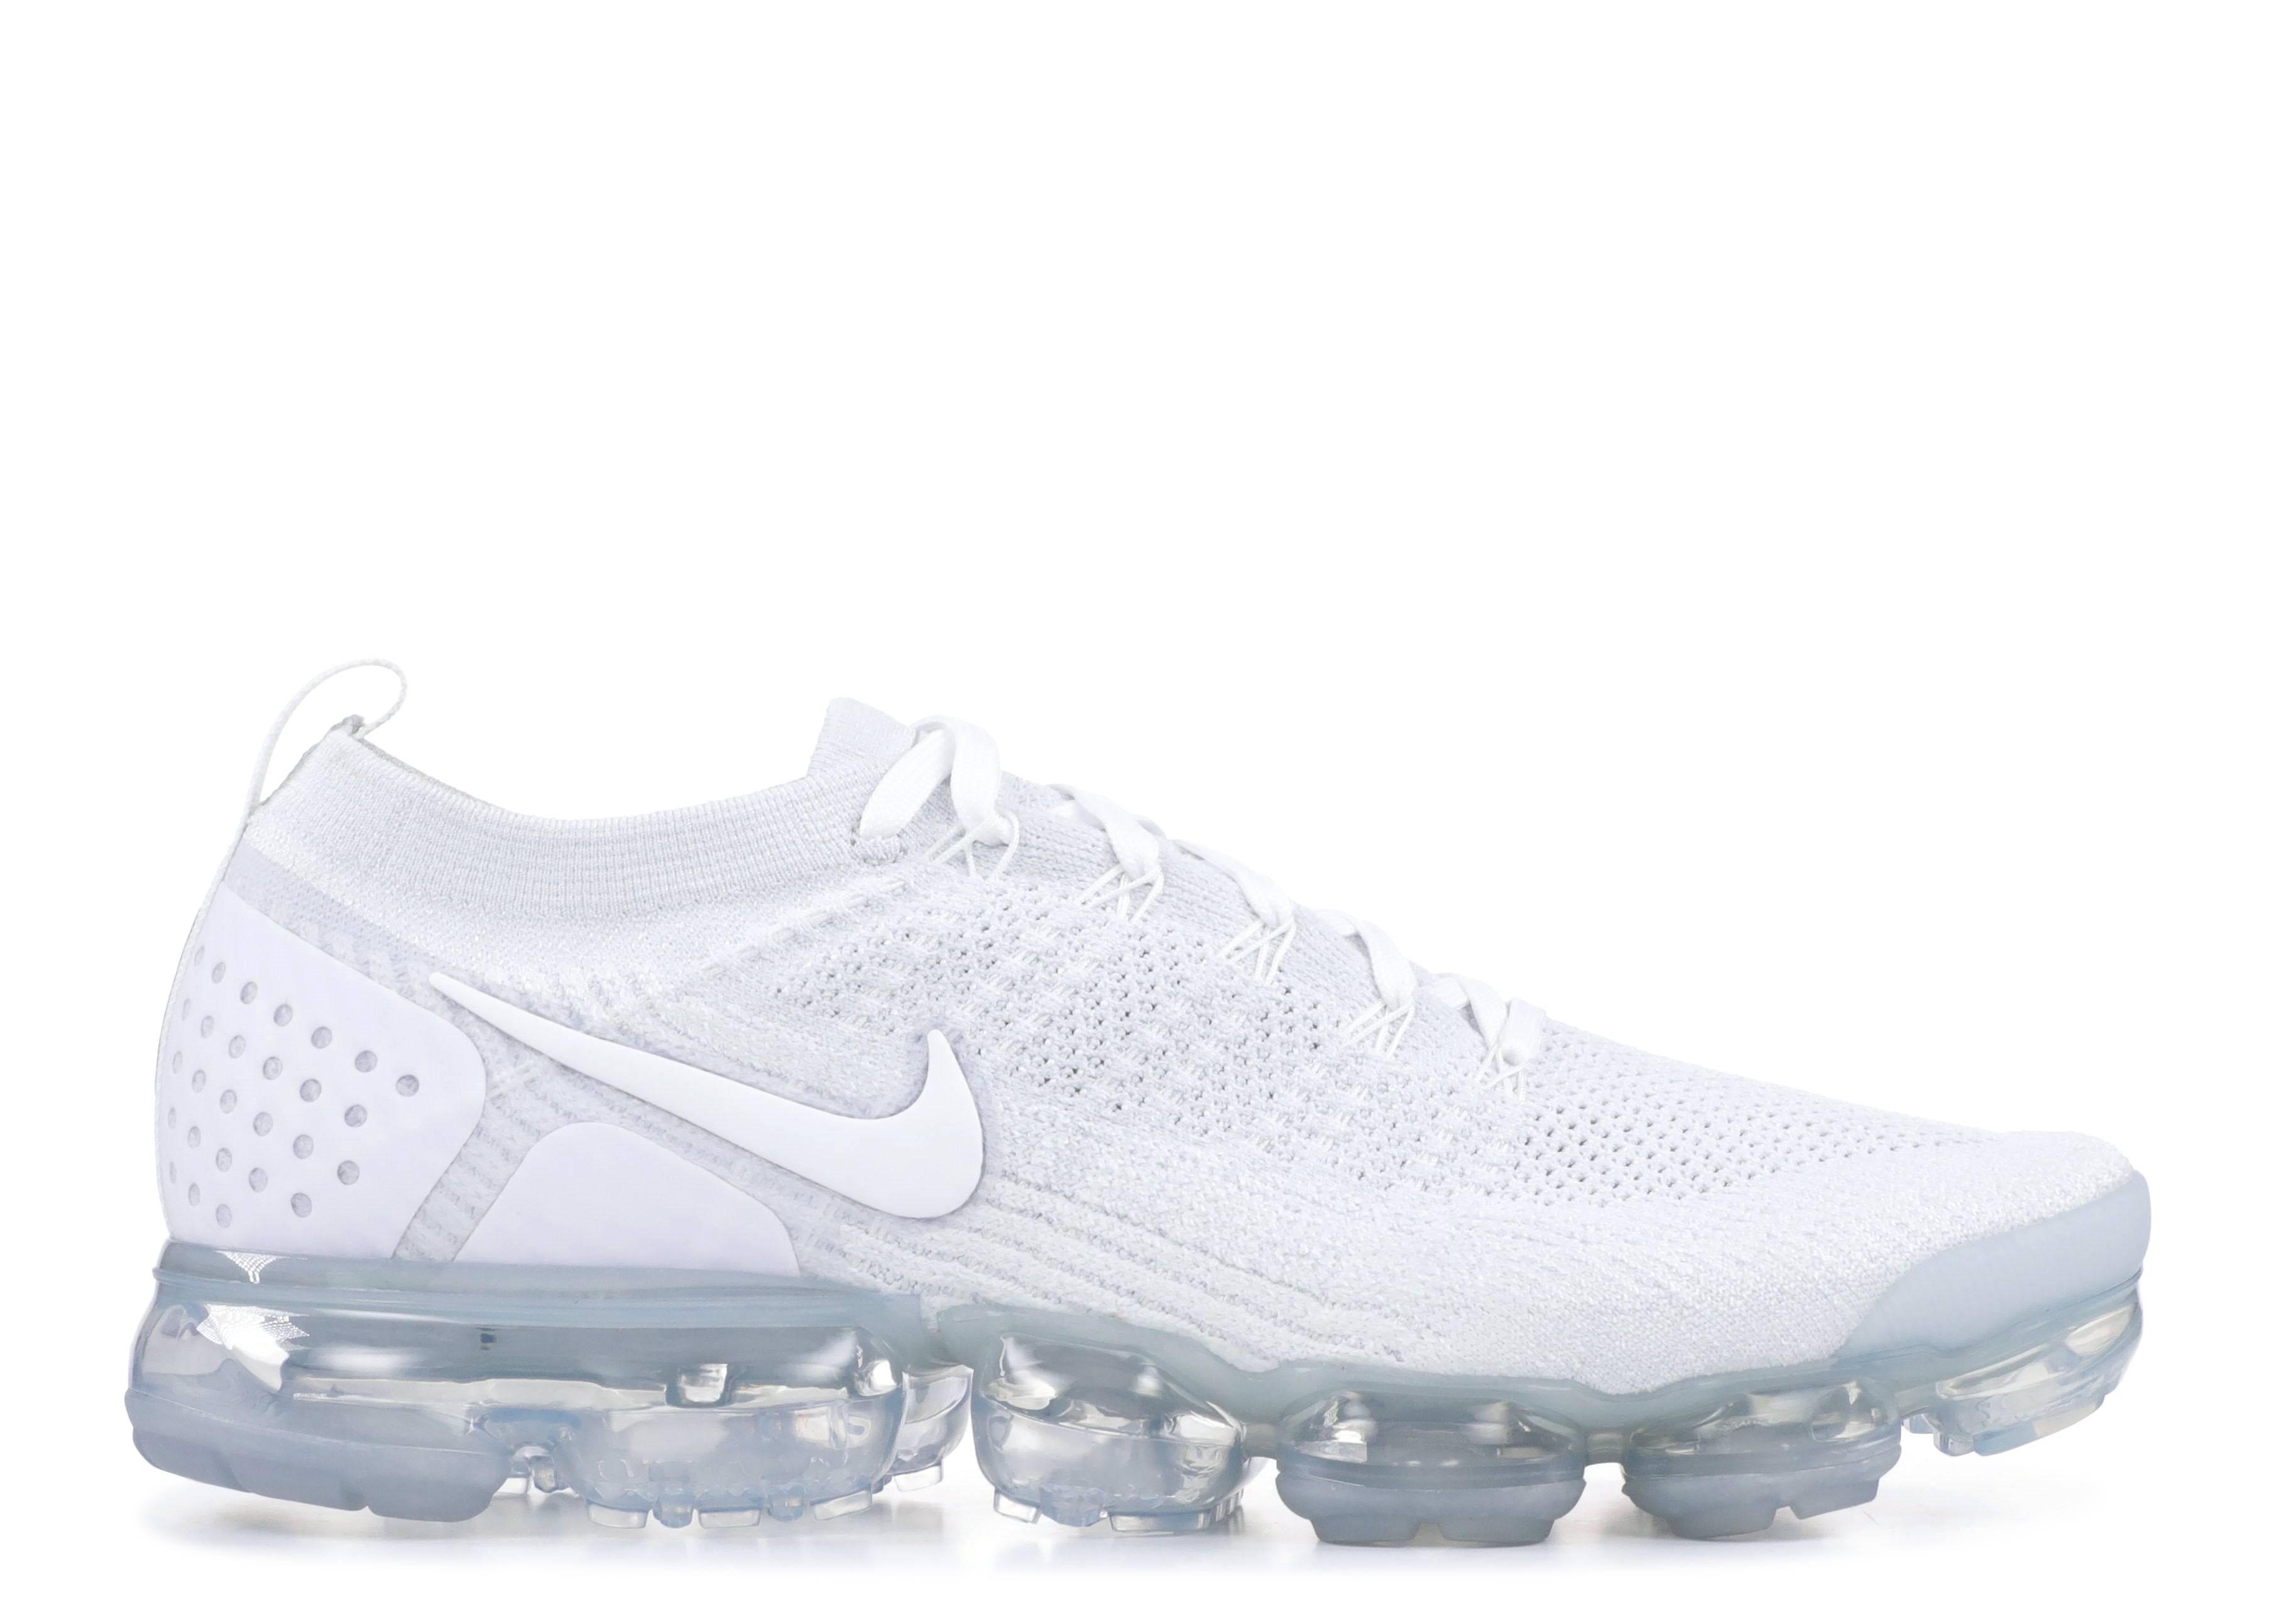 e8f317b9a3b0 Air Vapormax Flyknit 2 - Nike - 942842 100 - white white-pure ...